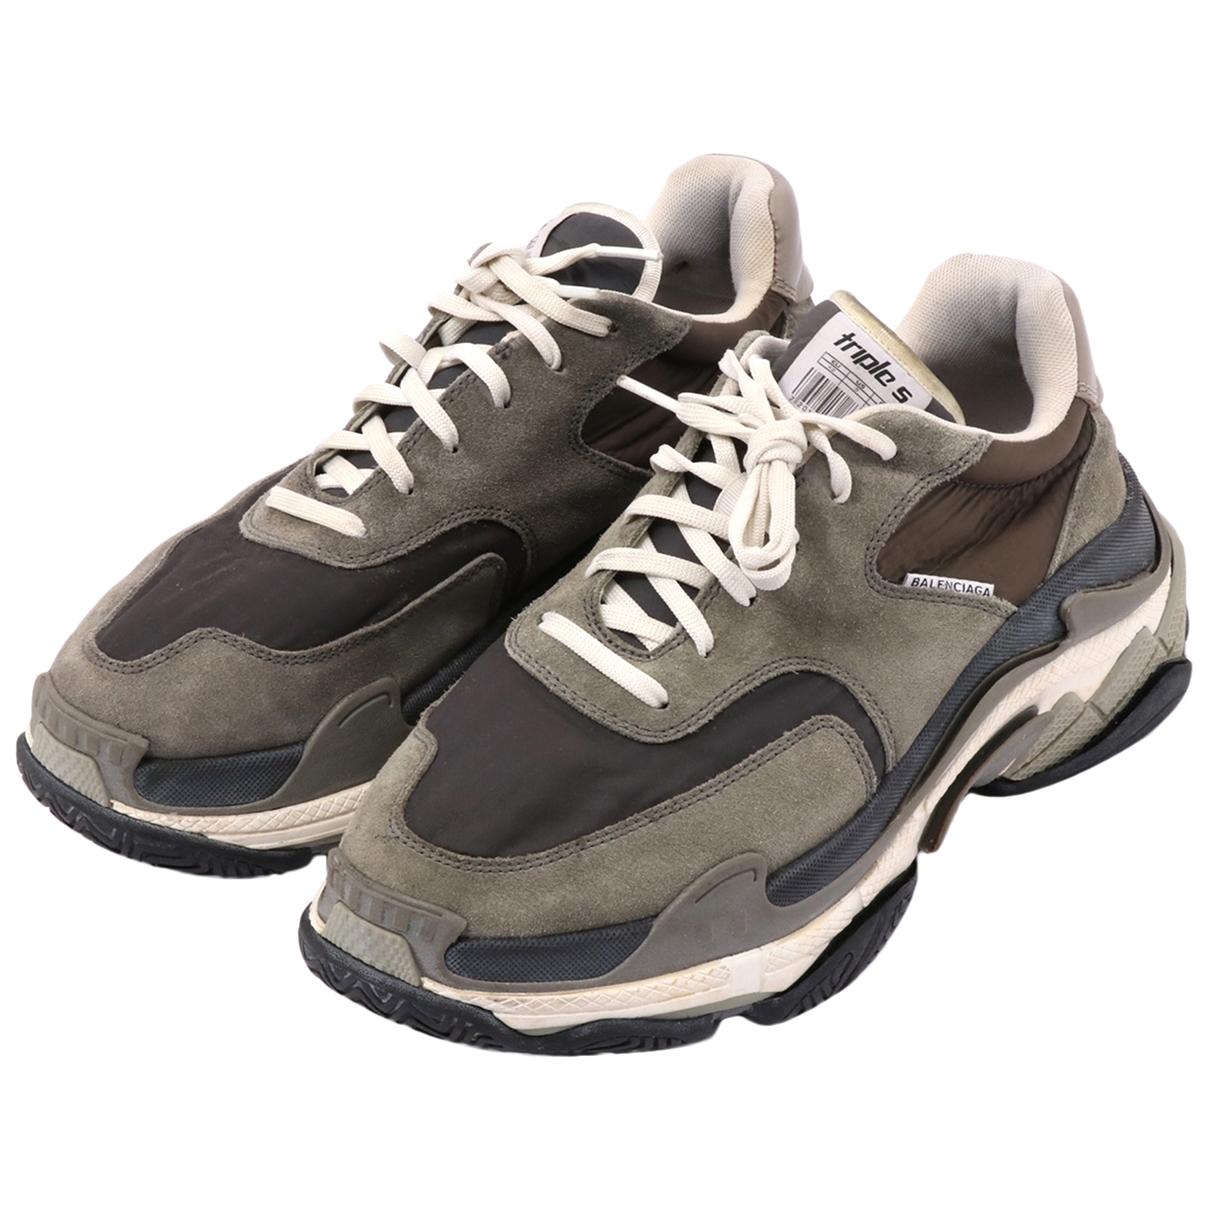 Balenciaga - Baskets   pour homme en cuir - gris